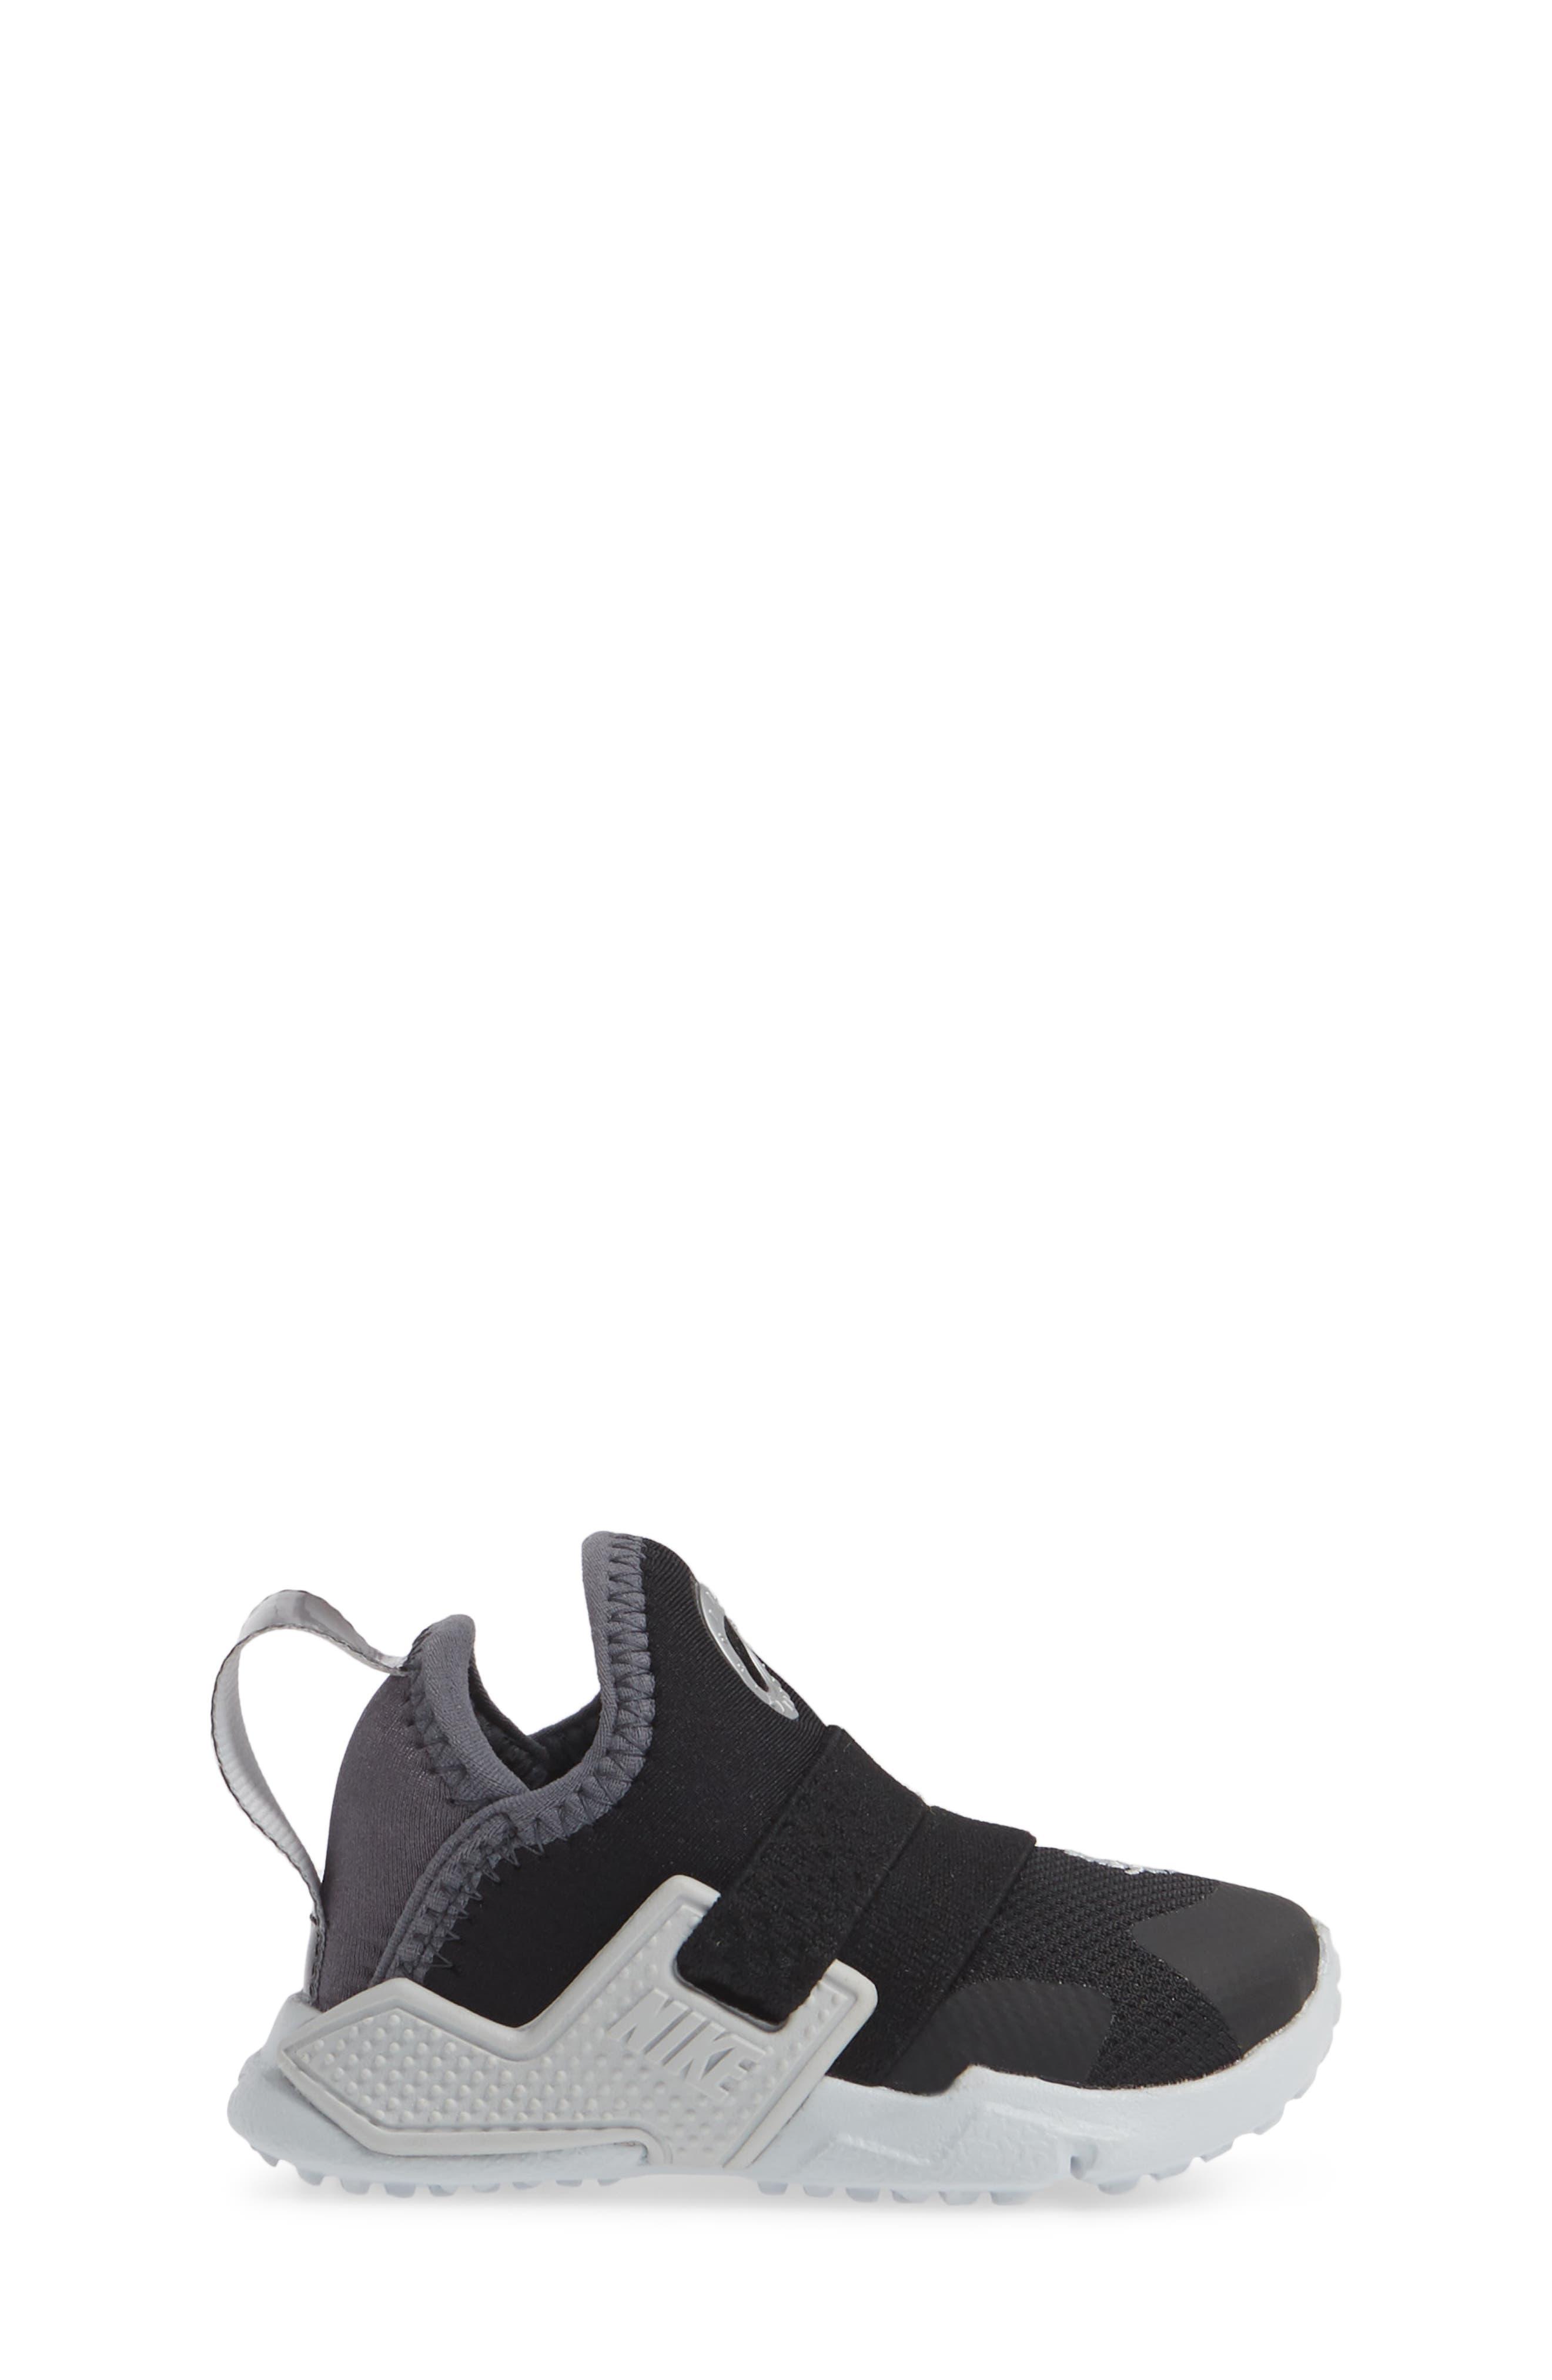 NIKE, Huarache Extreme Sneaker, Alternate thumbnail 3, color, BLACK/ METALLIC SILVER-GREY